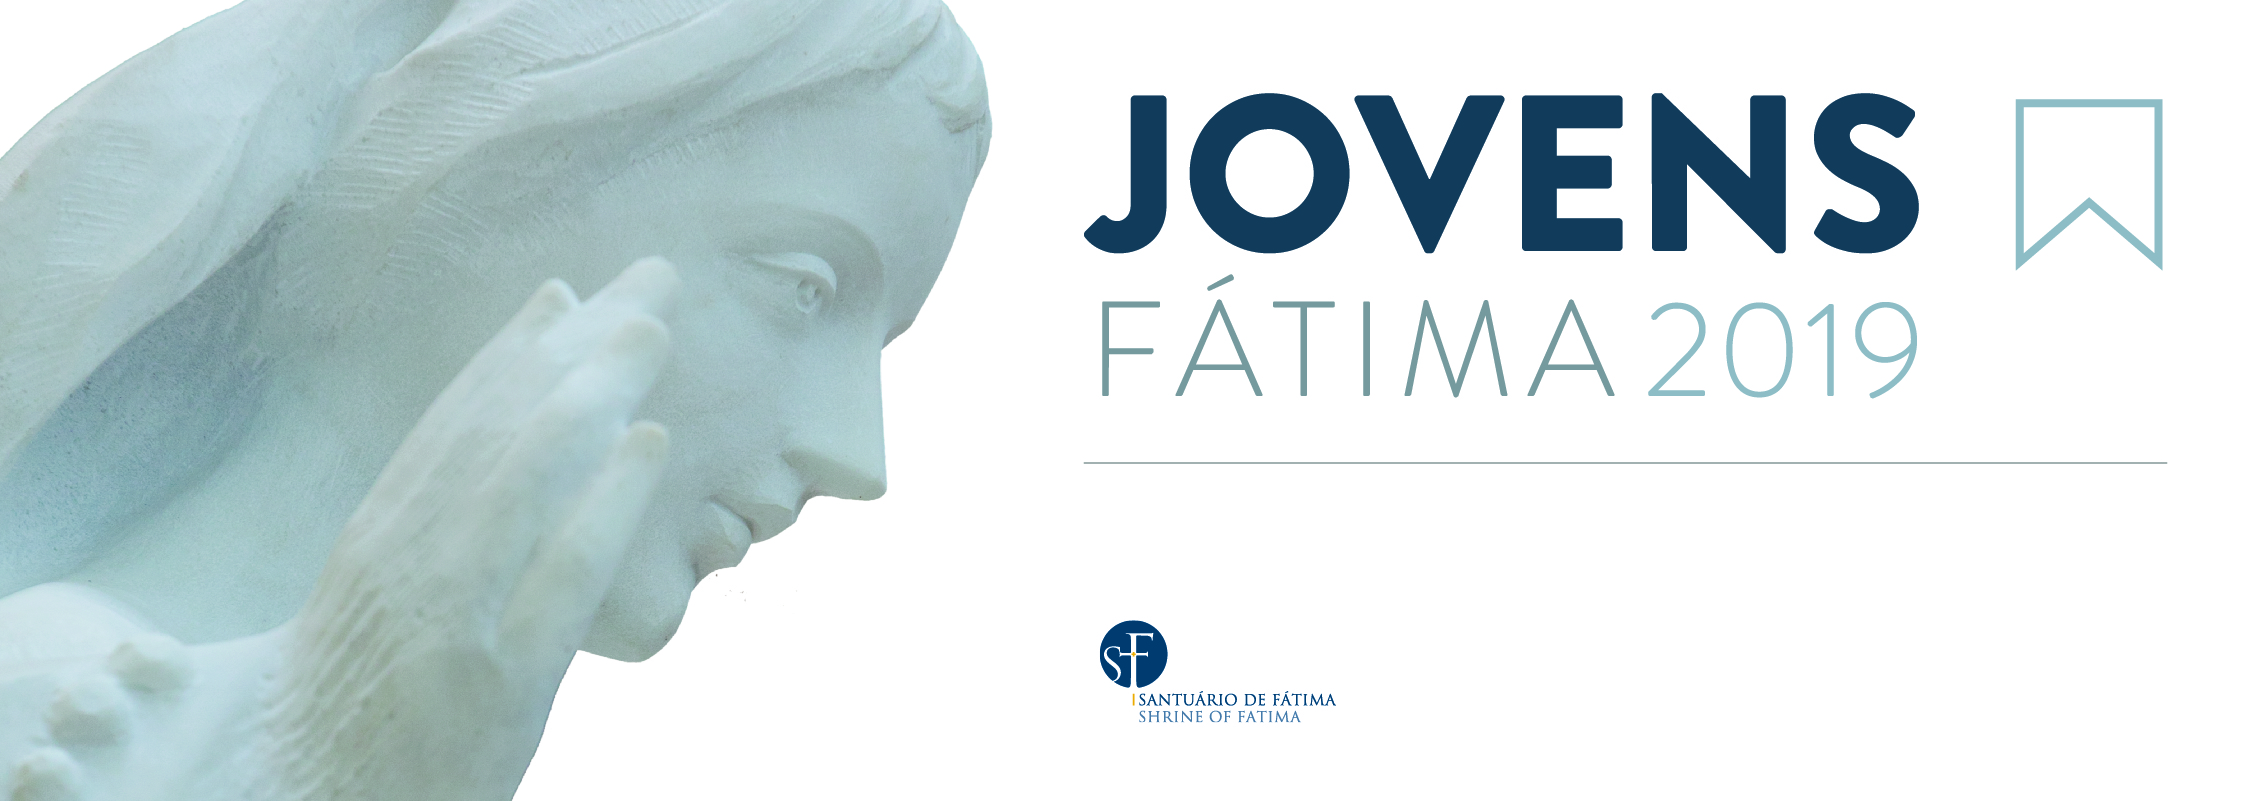 2019-04-12_Fatima_jovens_2.jpg